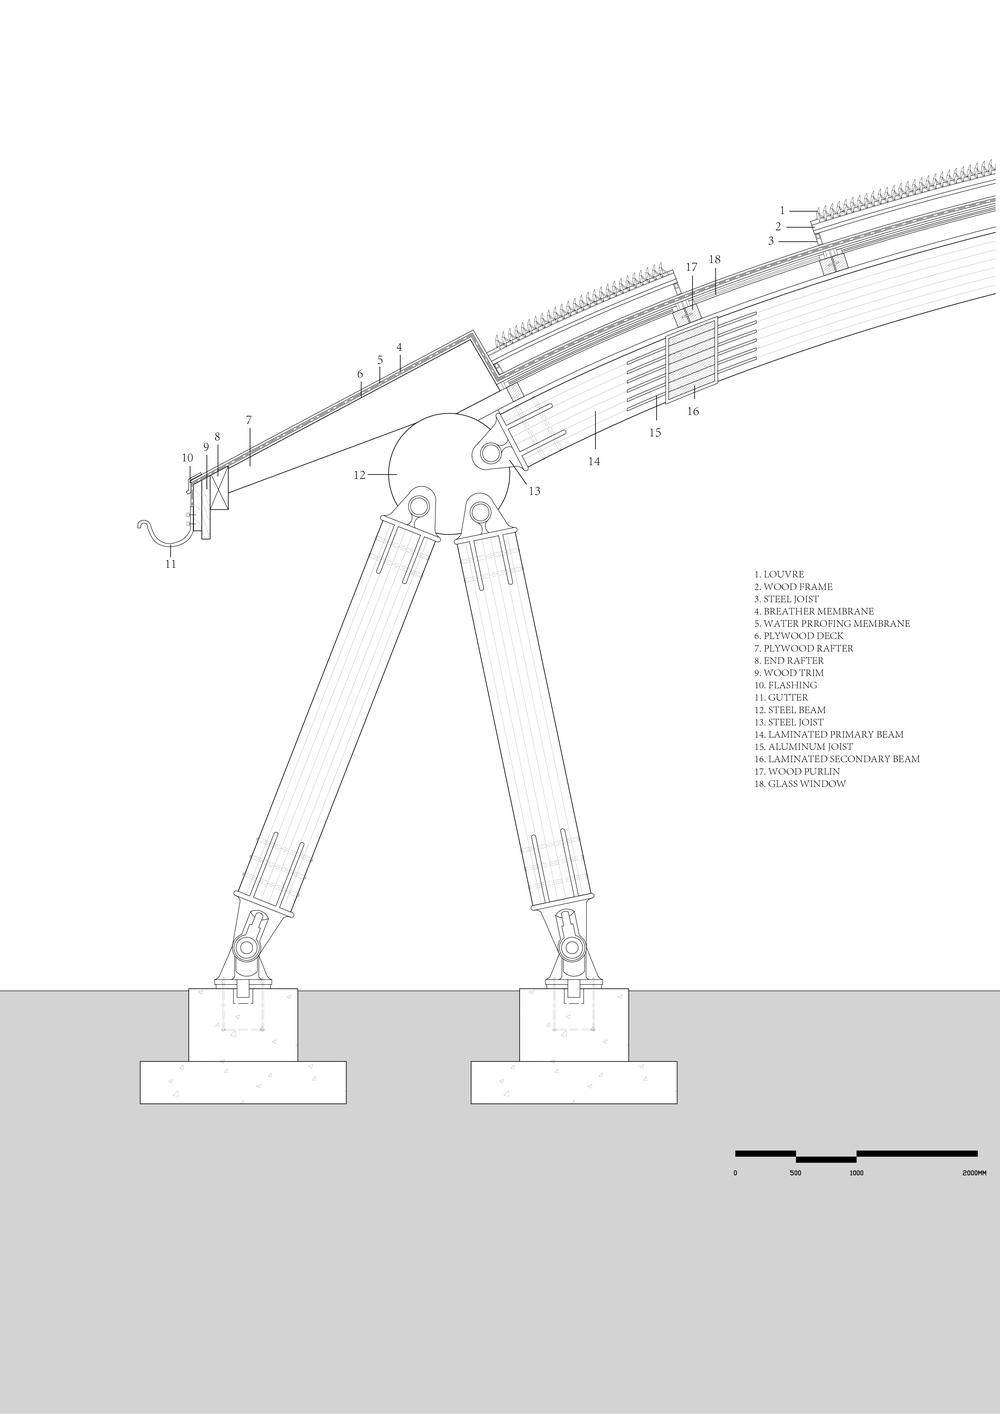 Construcion drawing.jpg